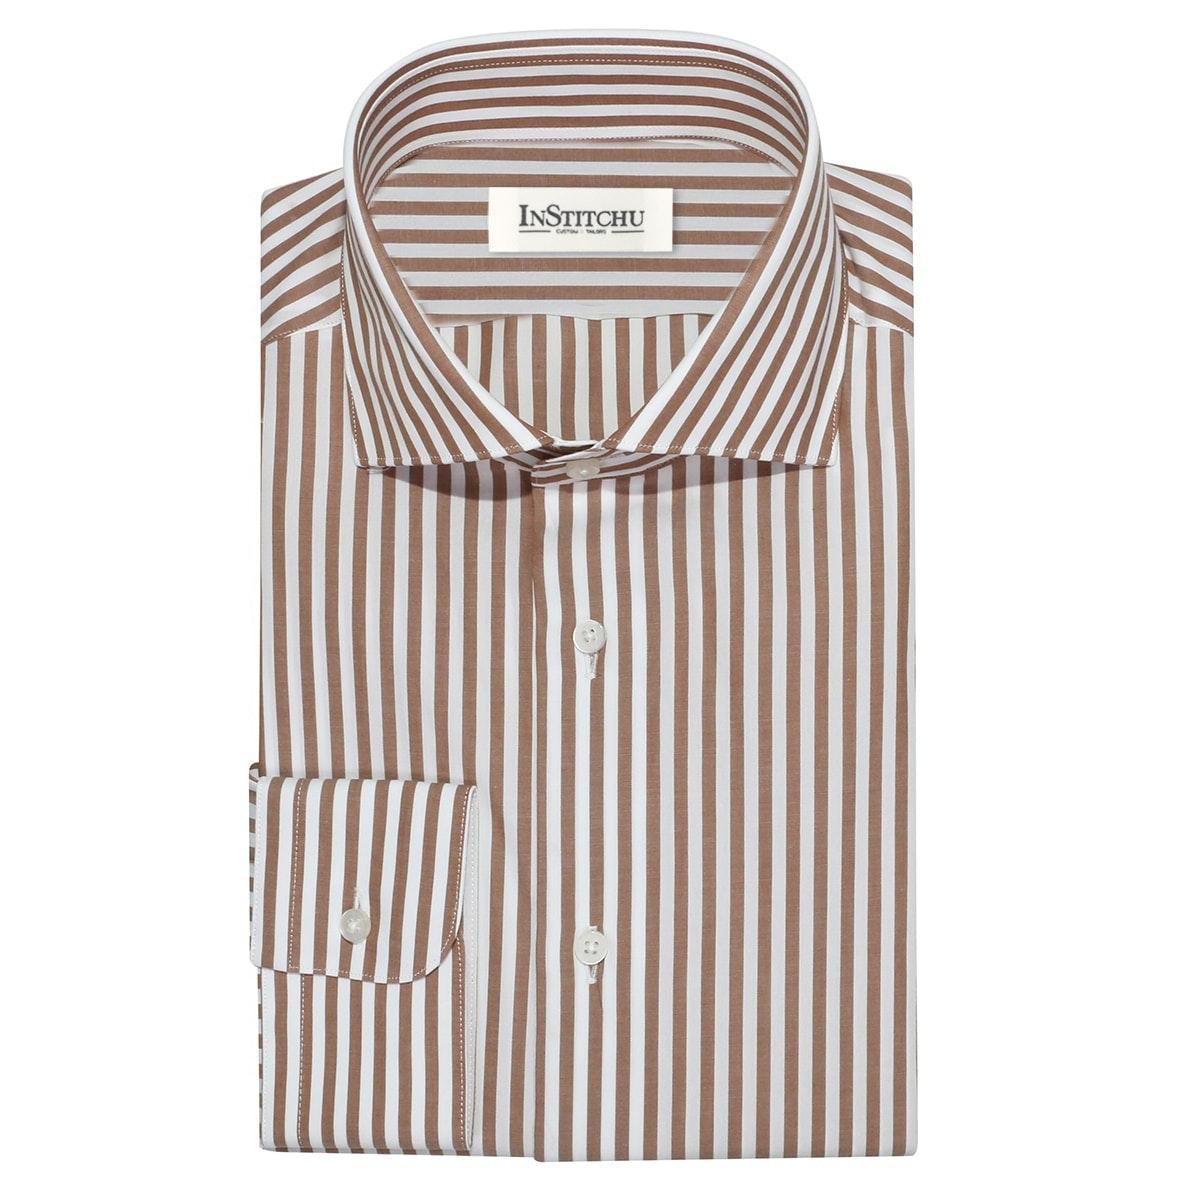 InStitchu Collection The Boulder Brown Stripe Shirt